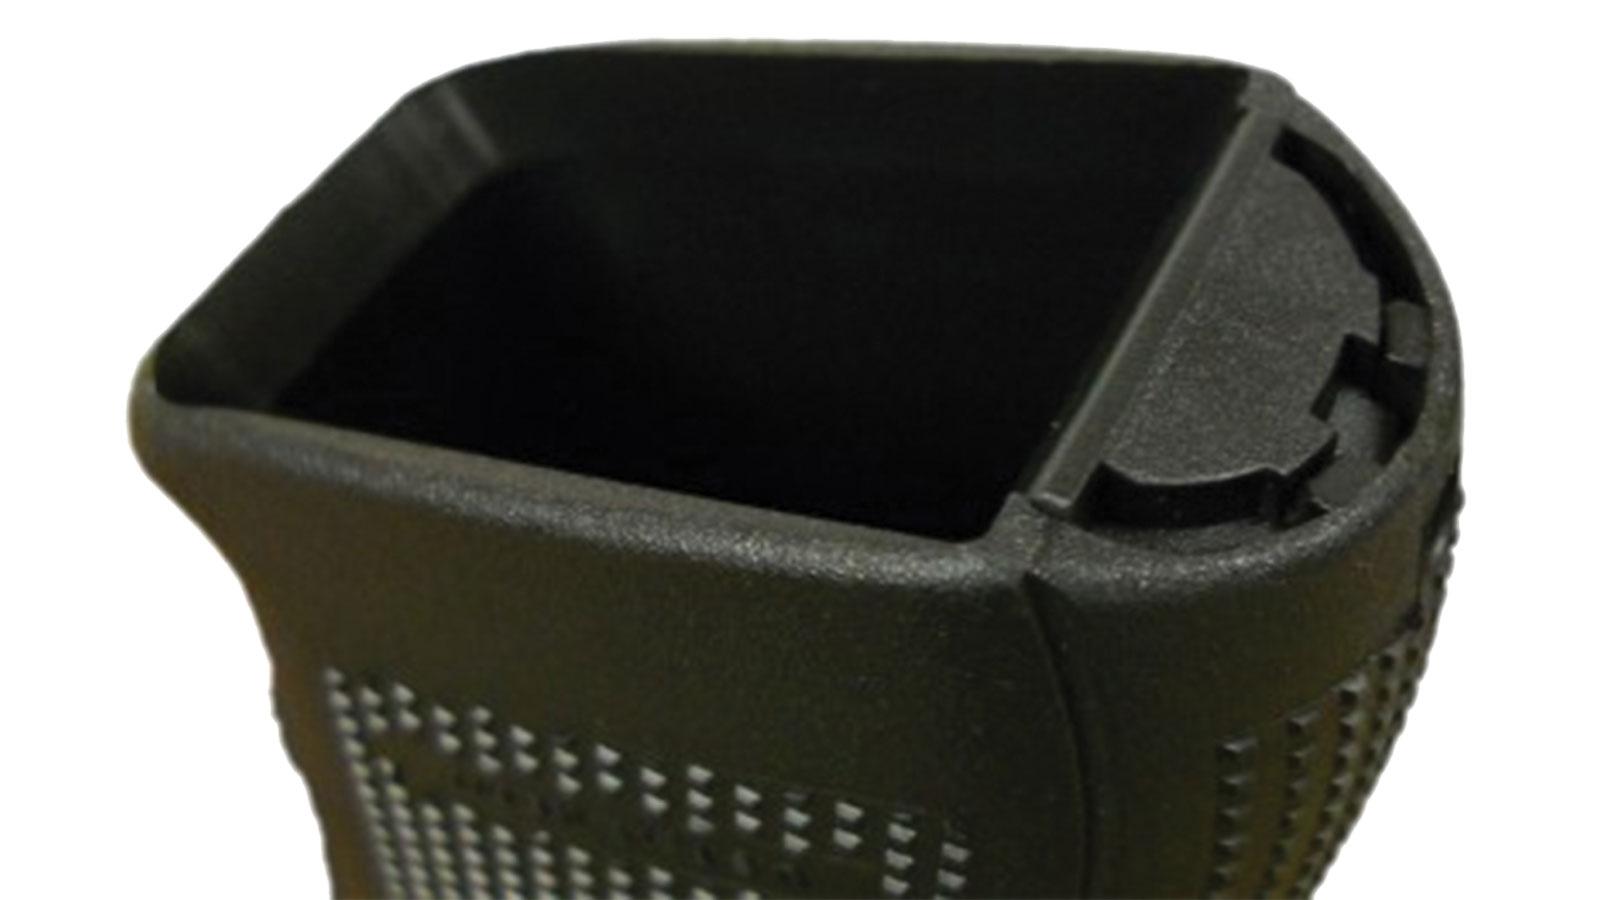 Pearce Grip PGFI21G4 Grip Frame Insert Glock 20|21|41 Black Polymer